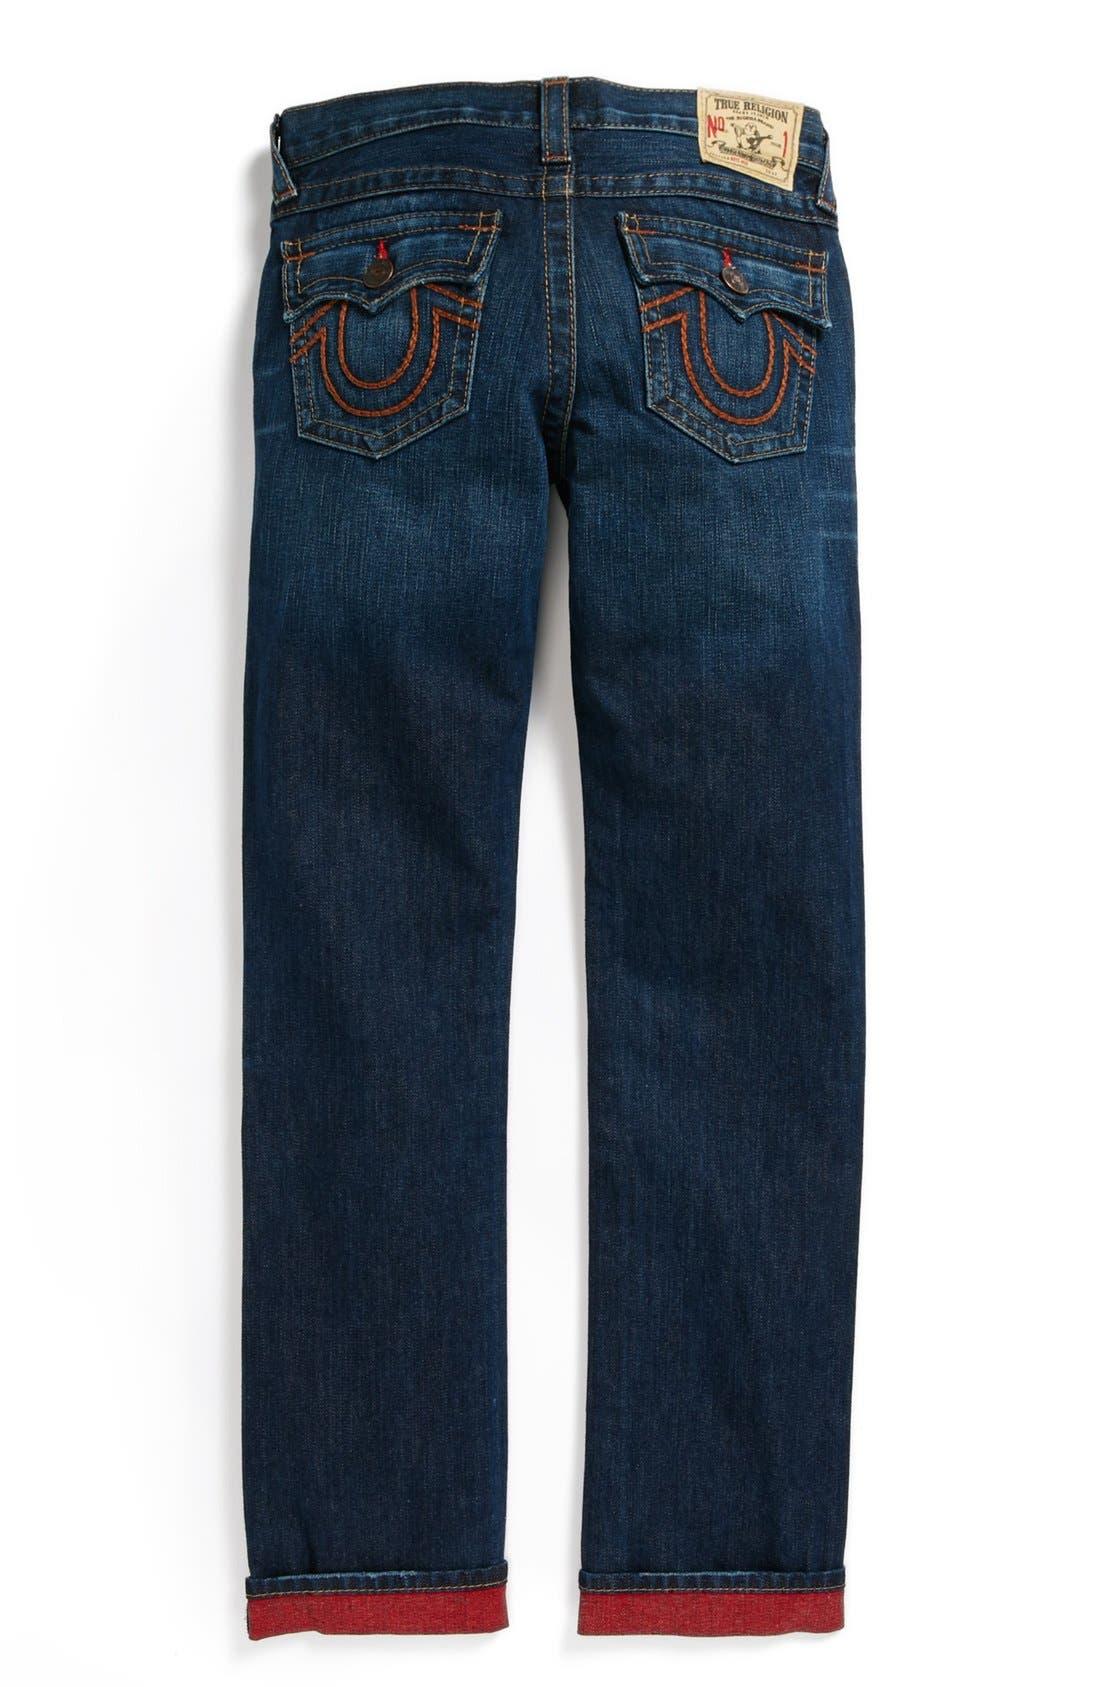 Main Image - True Religion Brand Jeans 'Jack' Reverse Dye Slim Leg Jeans (Little Boys & Big Boys)